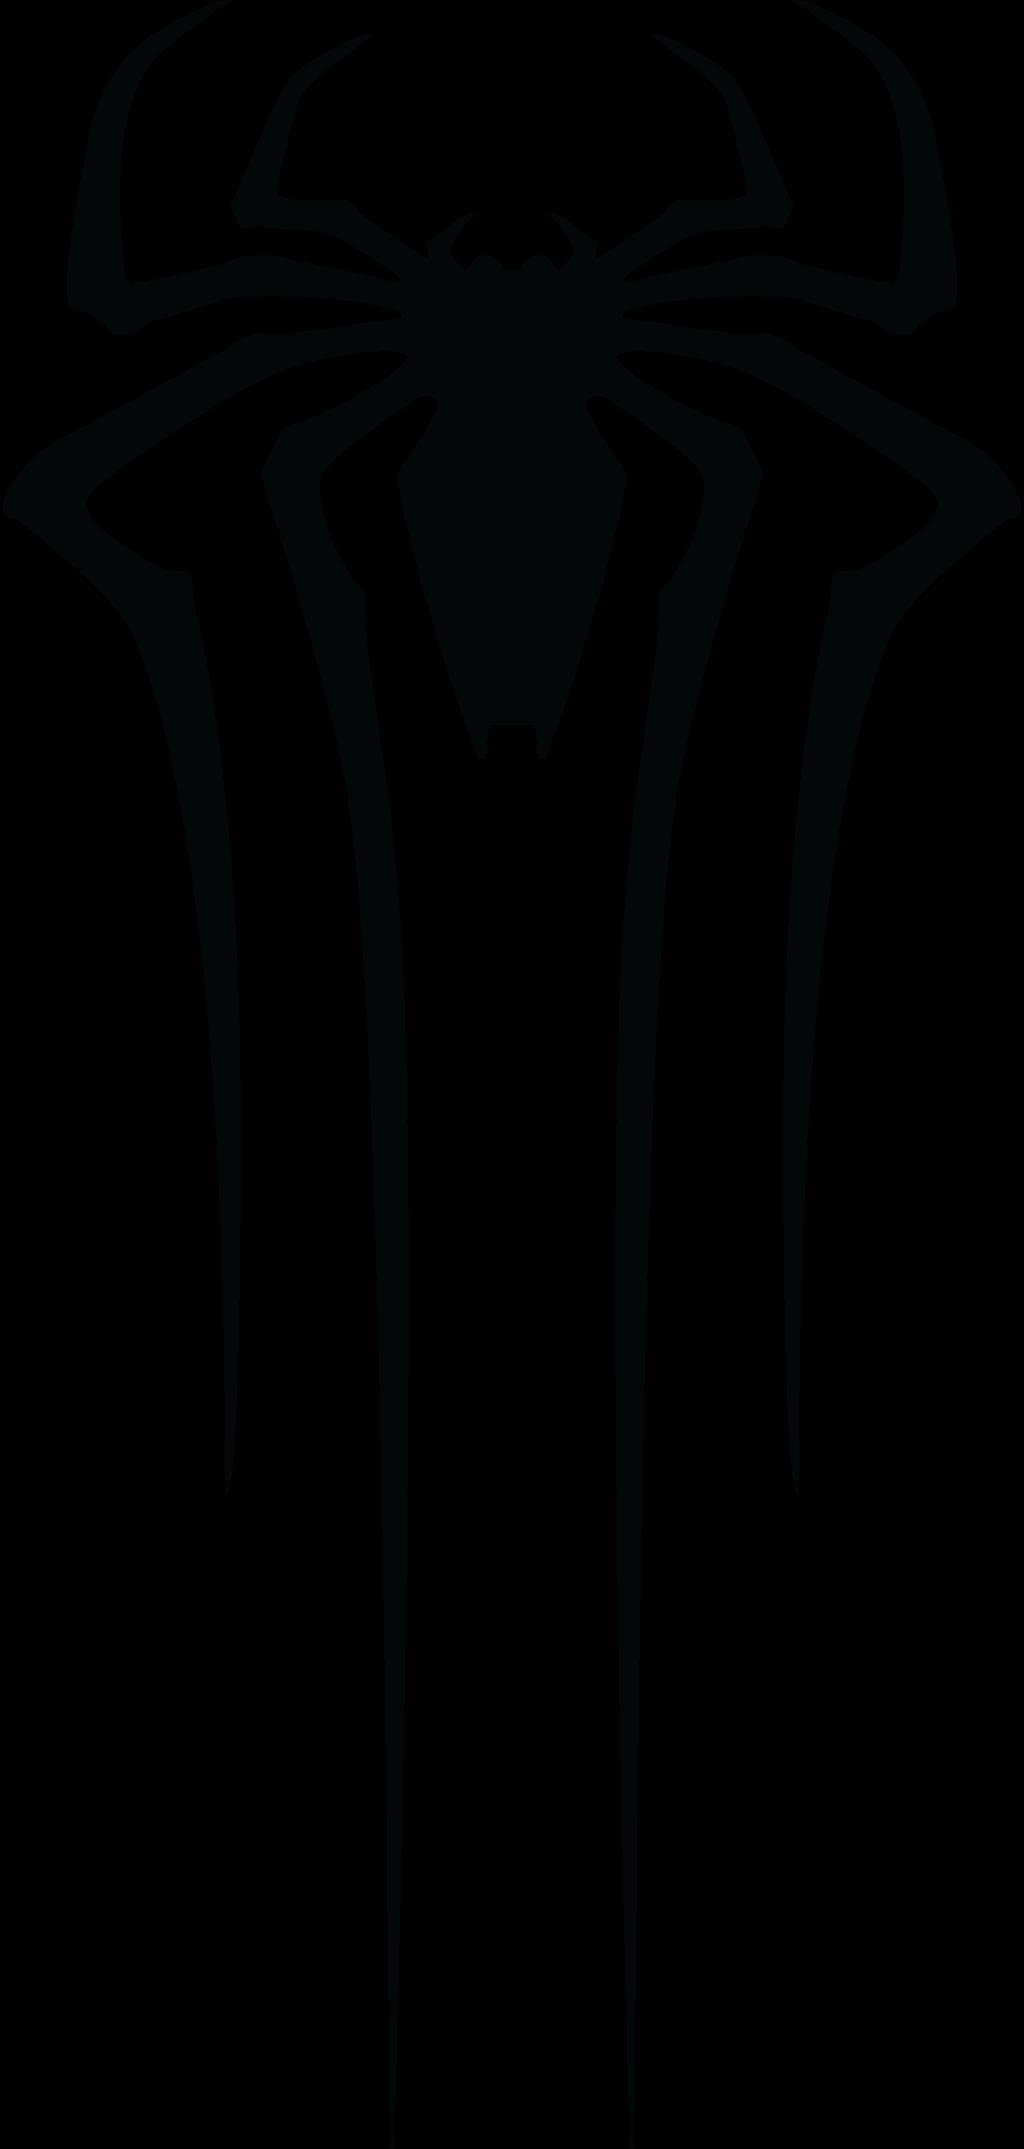 Spiderman logo clip art clipart best - Spider outline clip art ...